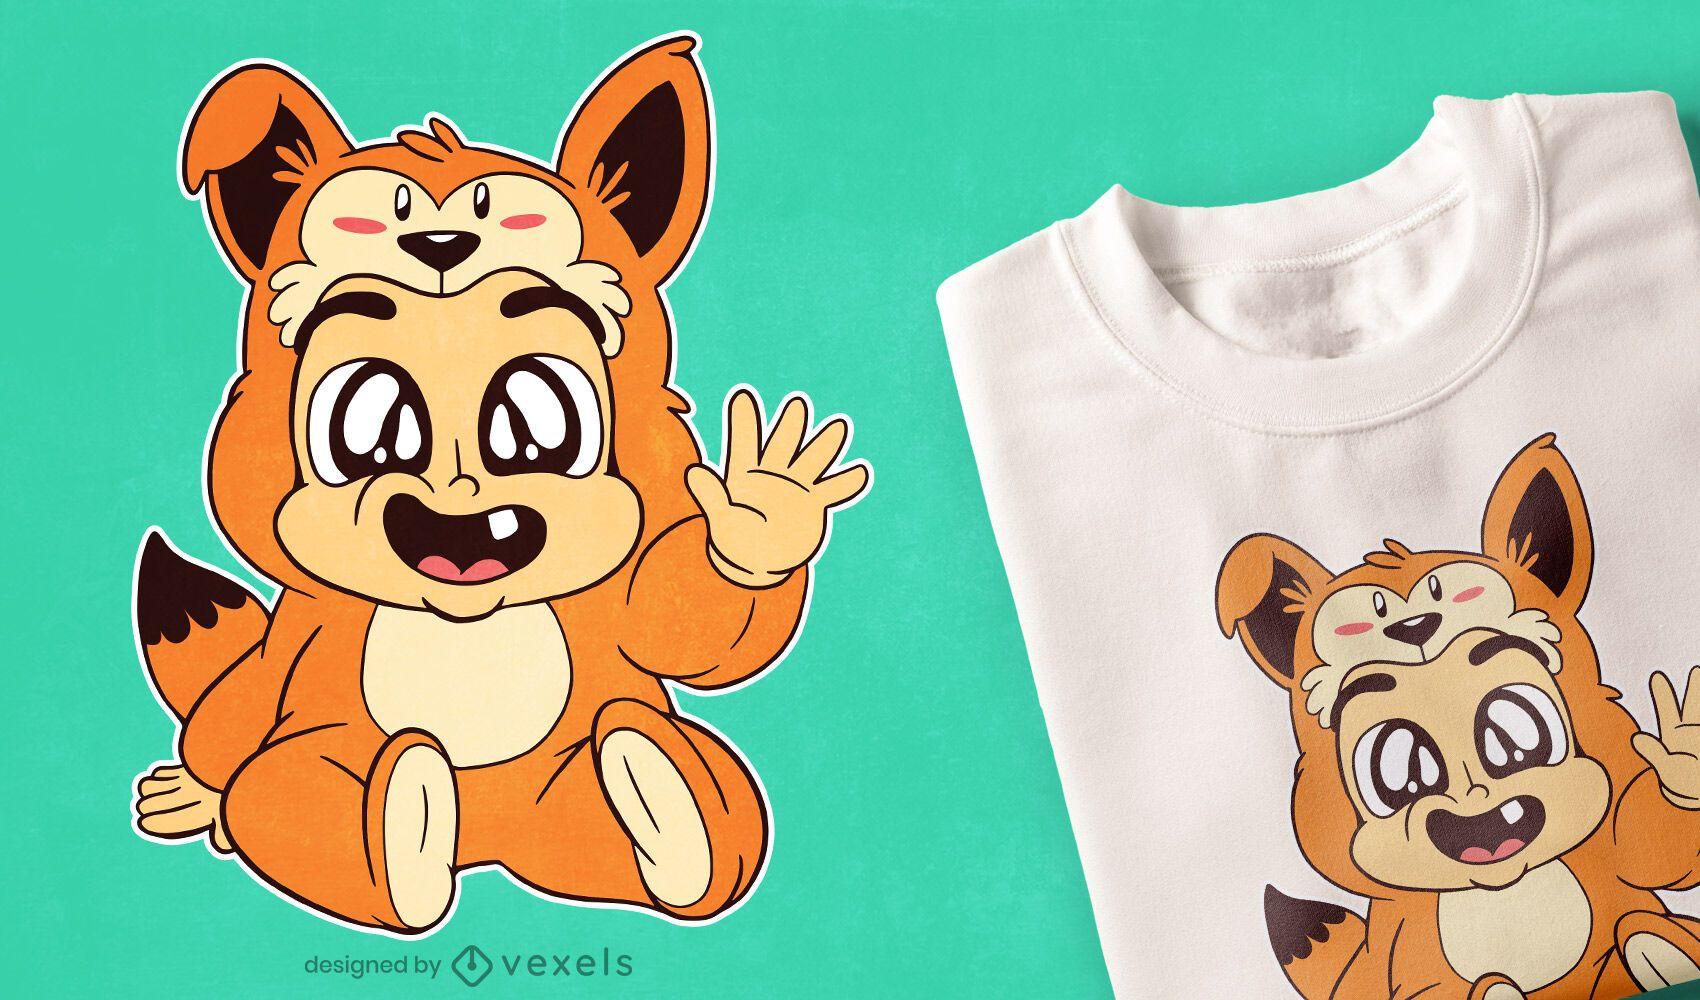 Baby fox t-shirt design